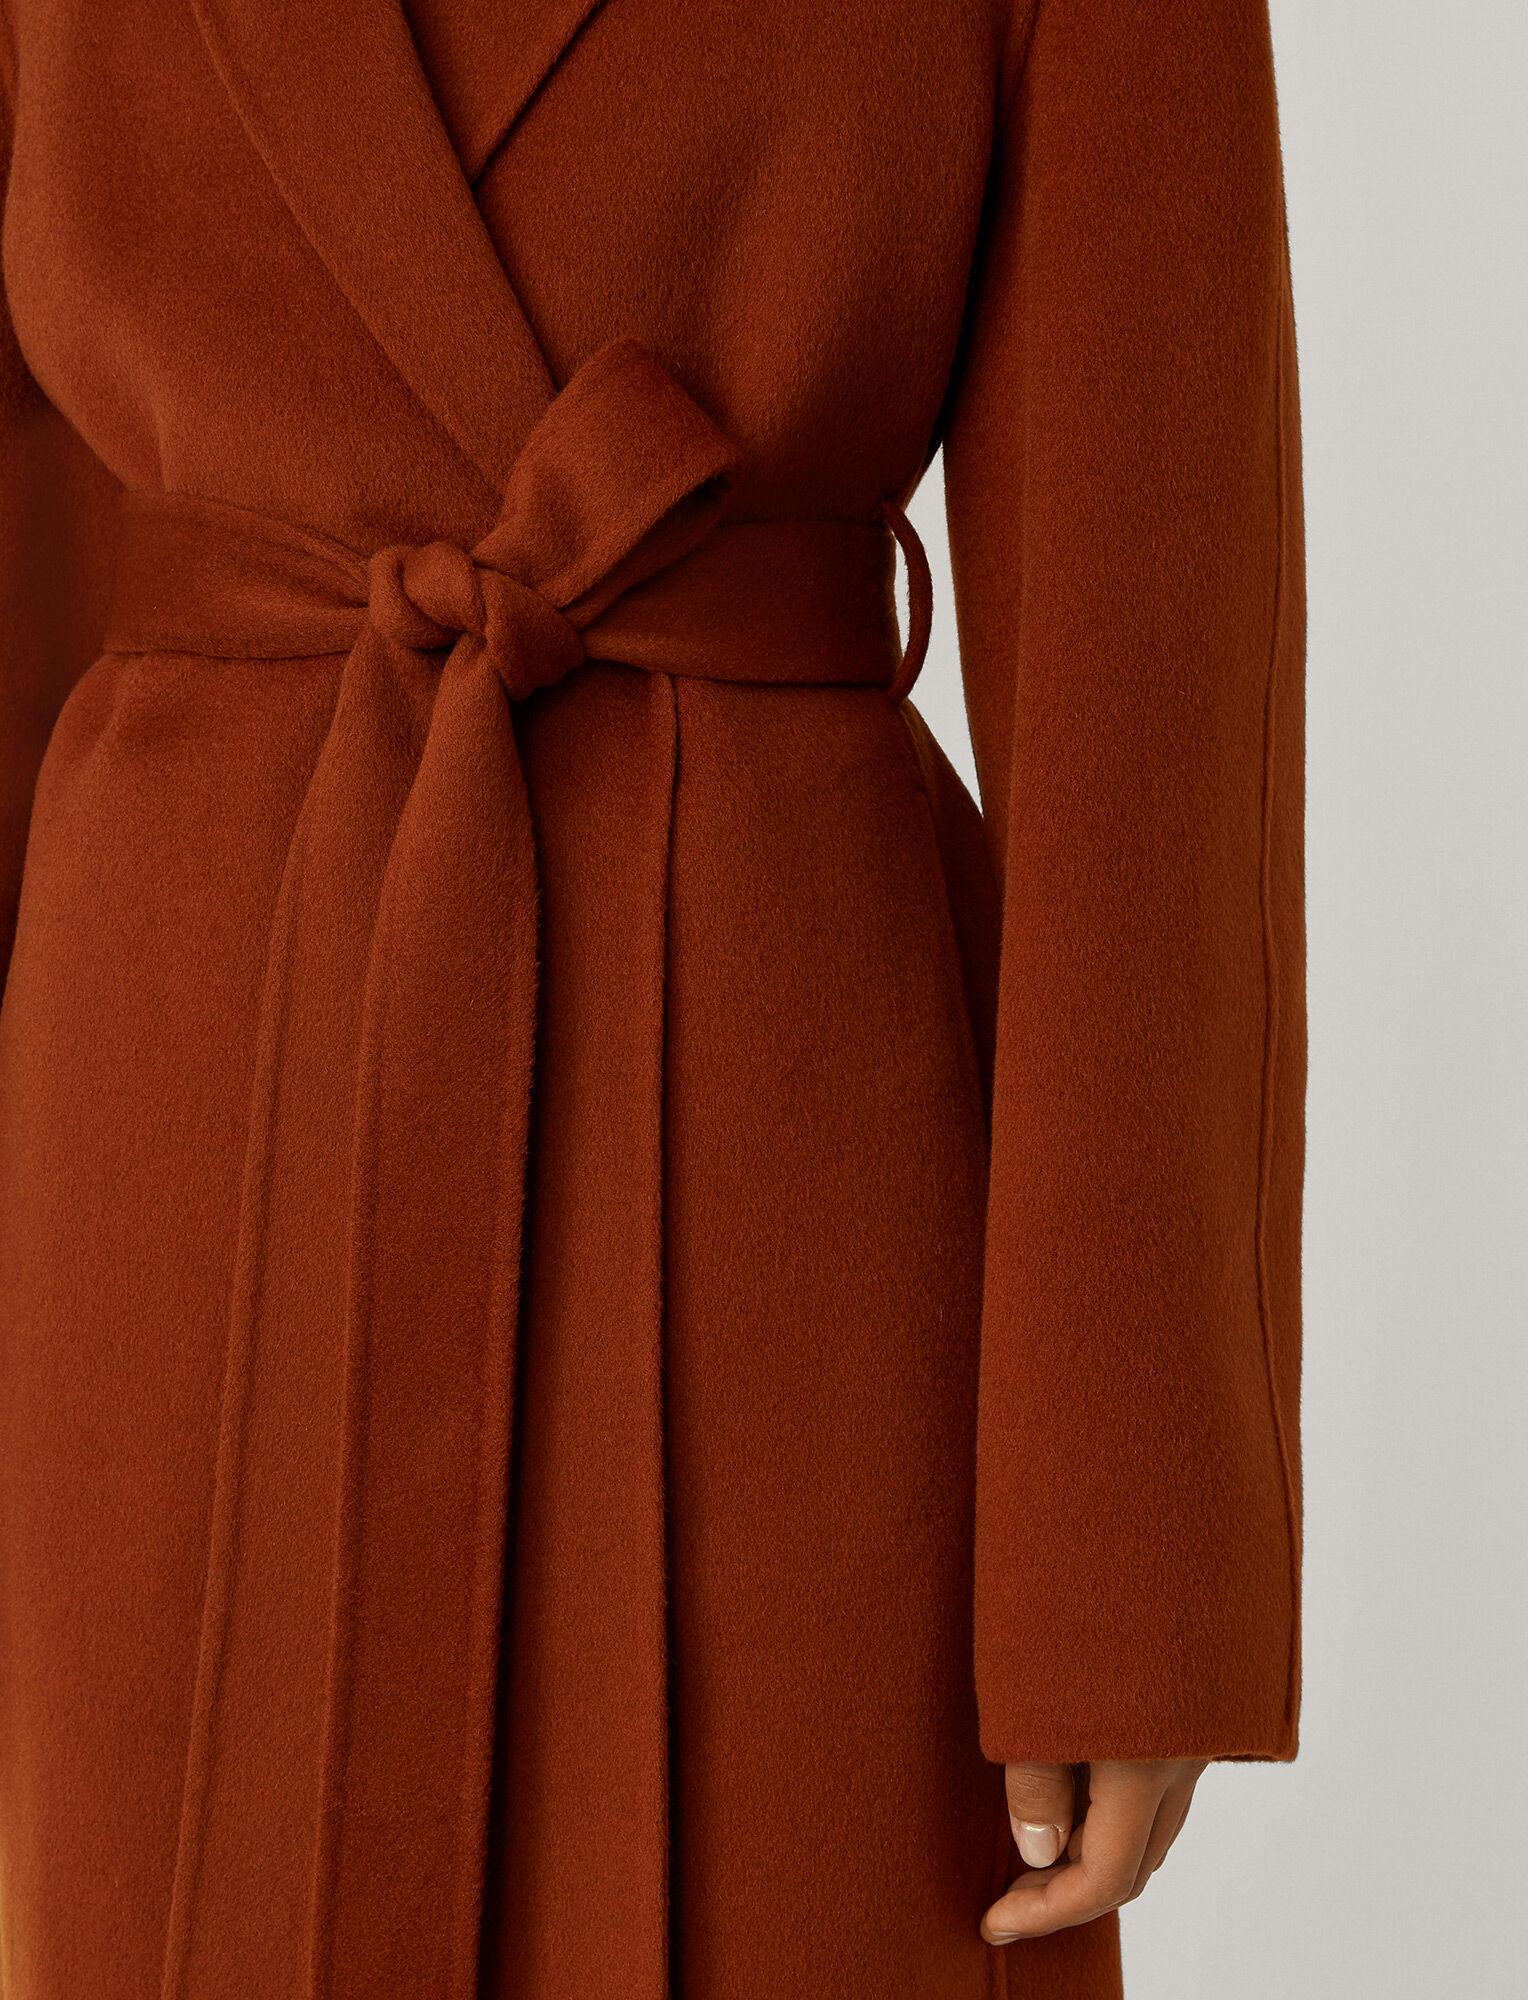 Joseph, Cenda Long Double Face Cashmere Coat, in Fox